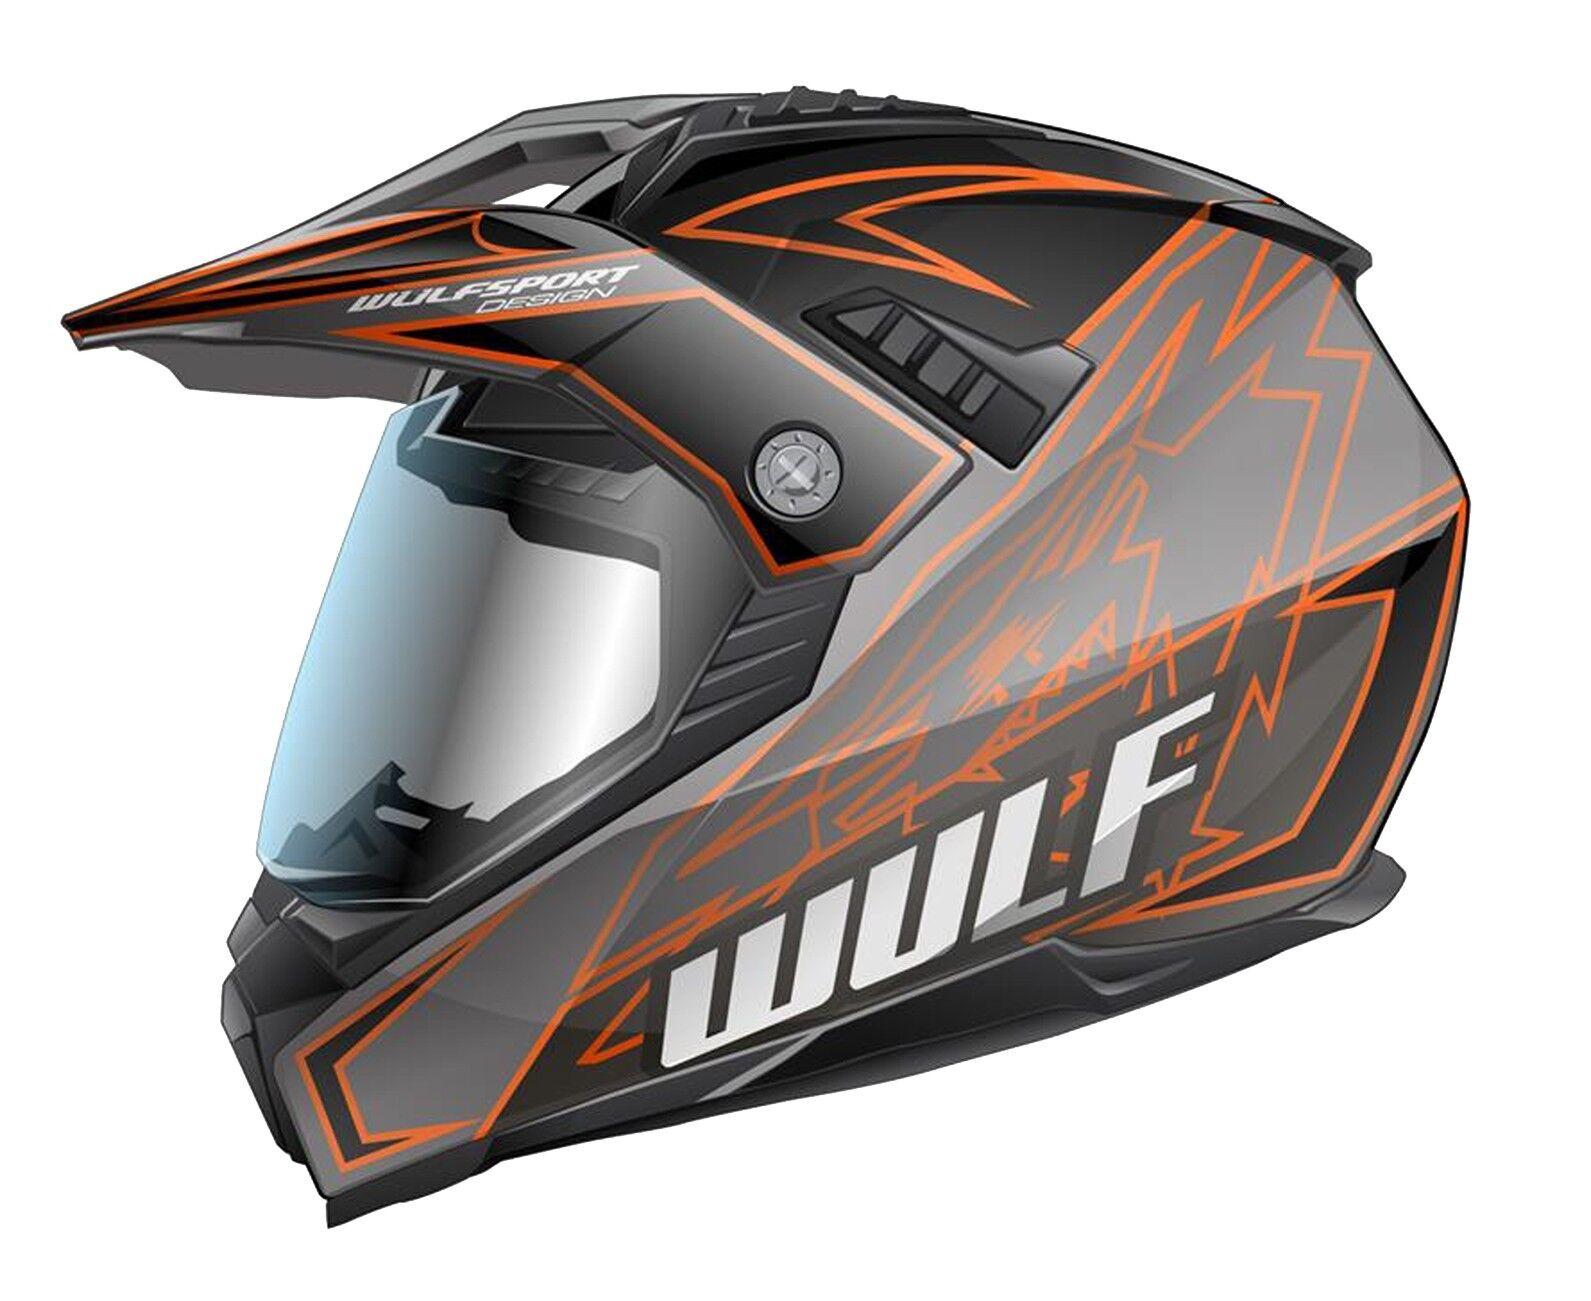 Wulfsport Prima-X Cross Helm M 57-58cm Orange Motorrad Quad Bike Enduro ATV usw.